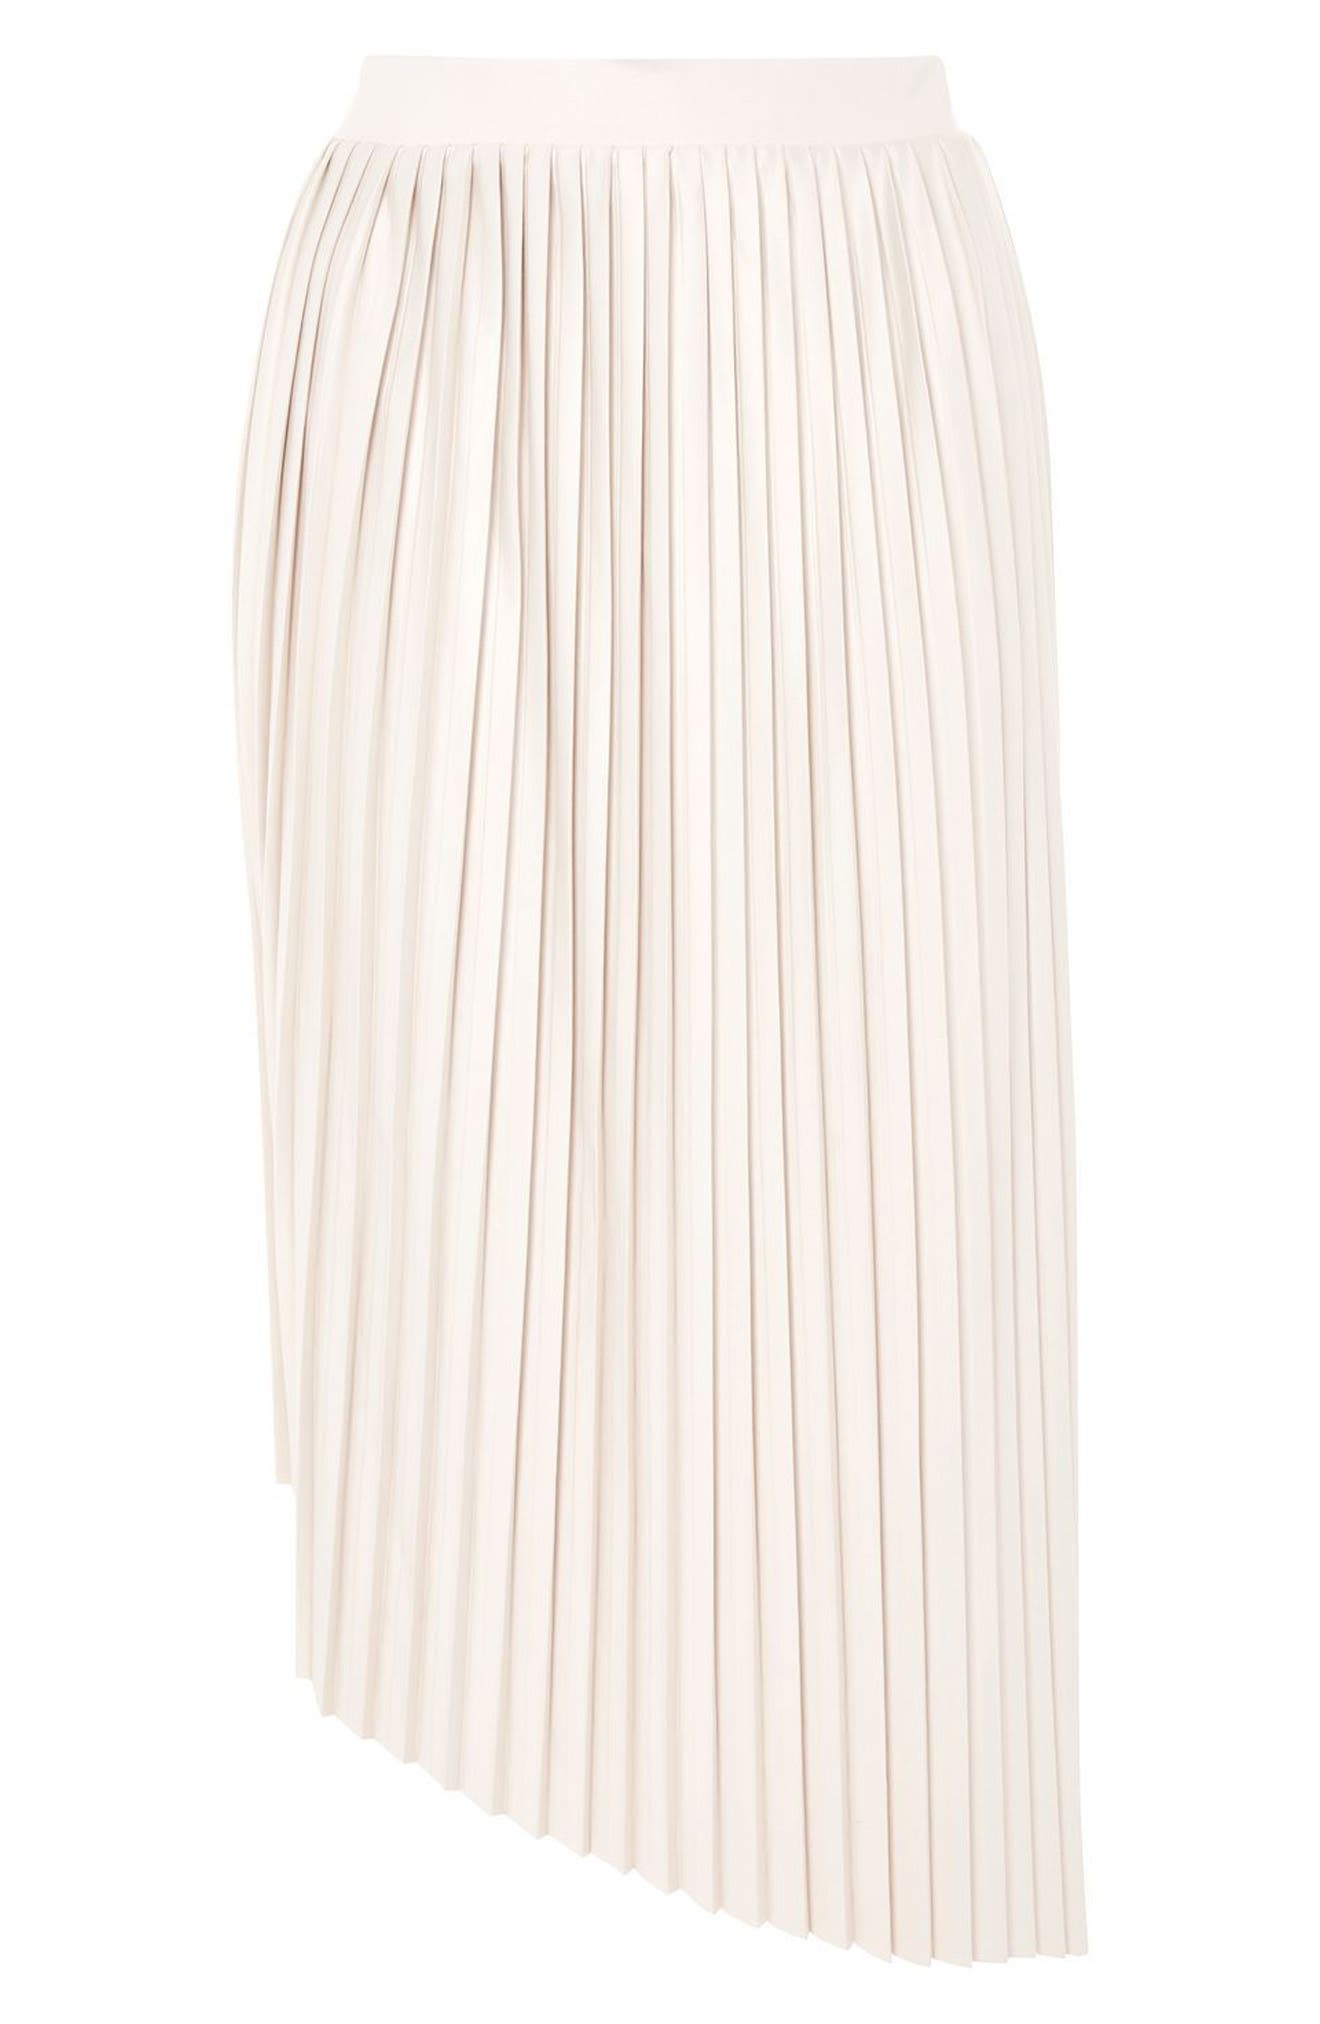 Asymmetrical Pleat Midi Skirt,                             Alternate thumbnail 3, color,                             Beige